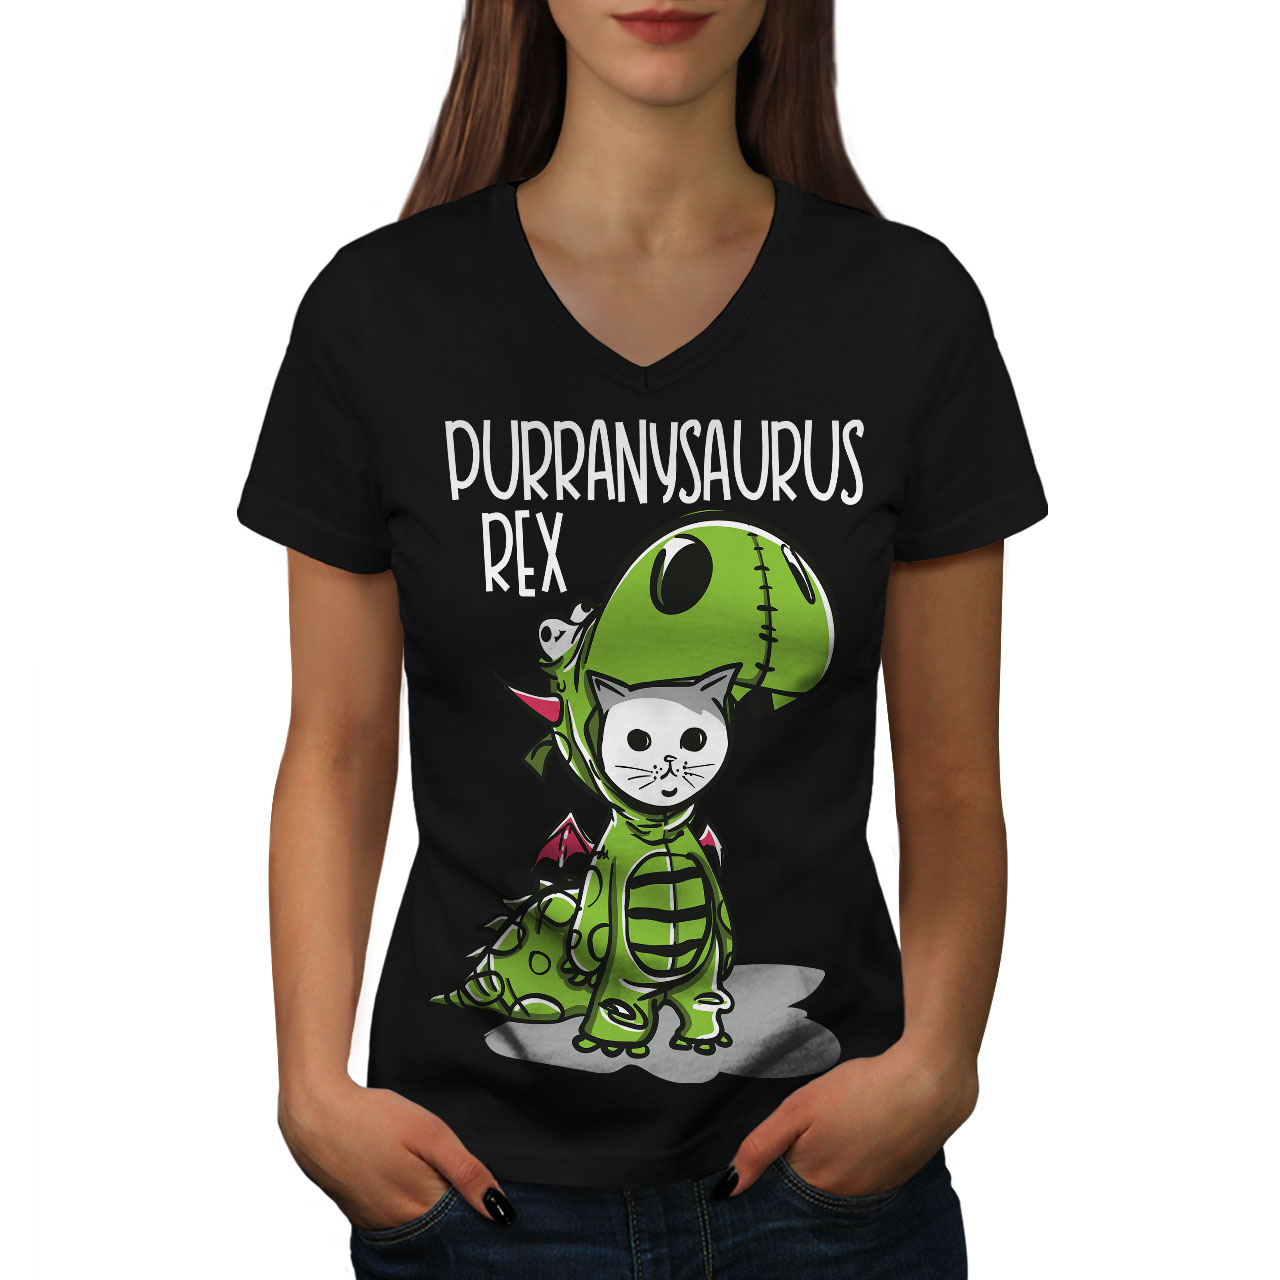 Carino-dinosauro-Donne-V-Neck-T-shirt-Nuove-wellcoda miniatura 3